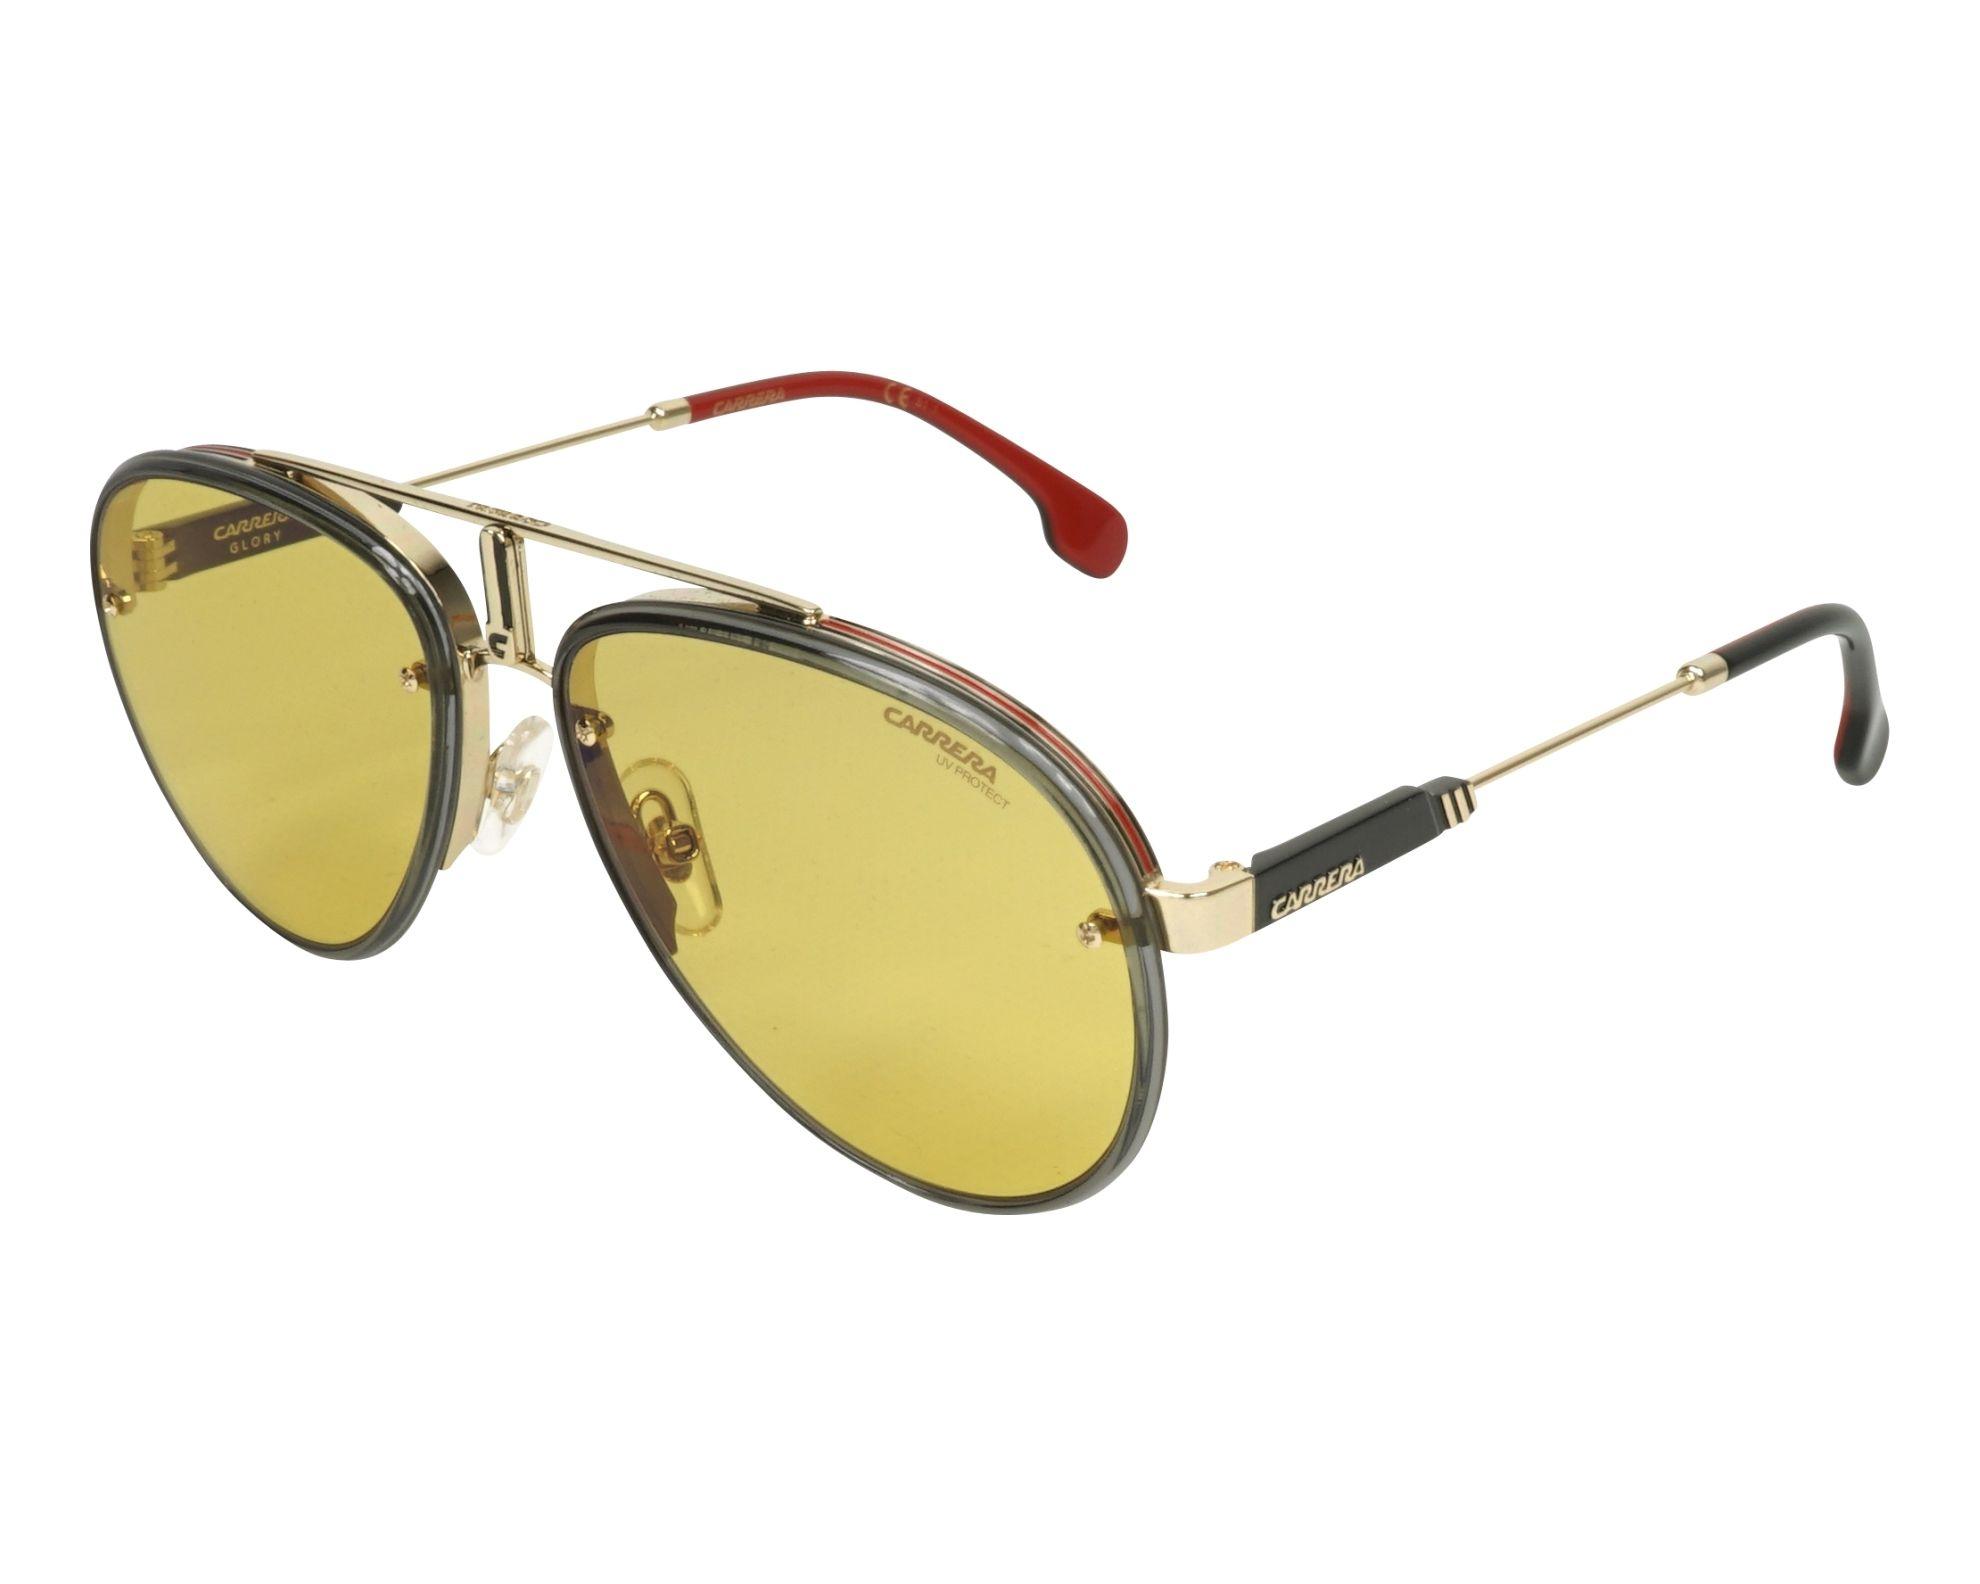 Sunglasses Carrera GLORY DYG HW 58-17 Gold Grey profile view 1b9362cfbdb